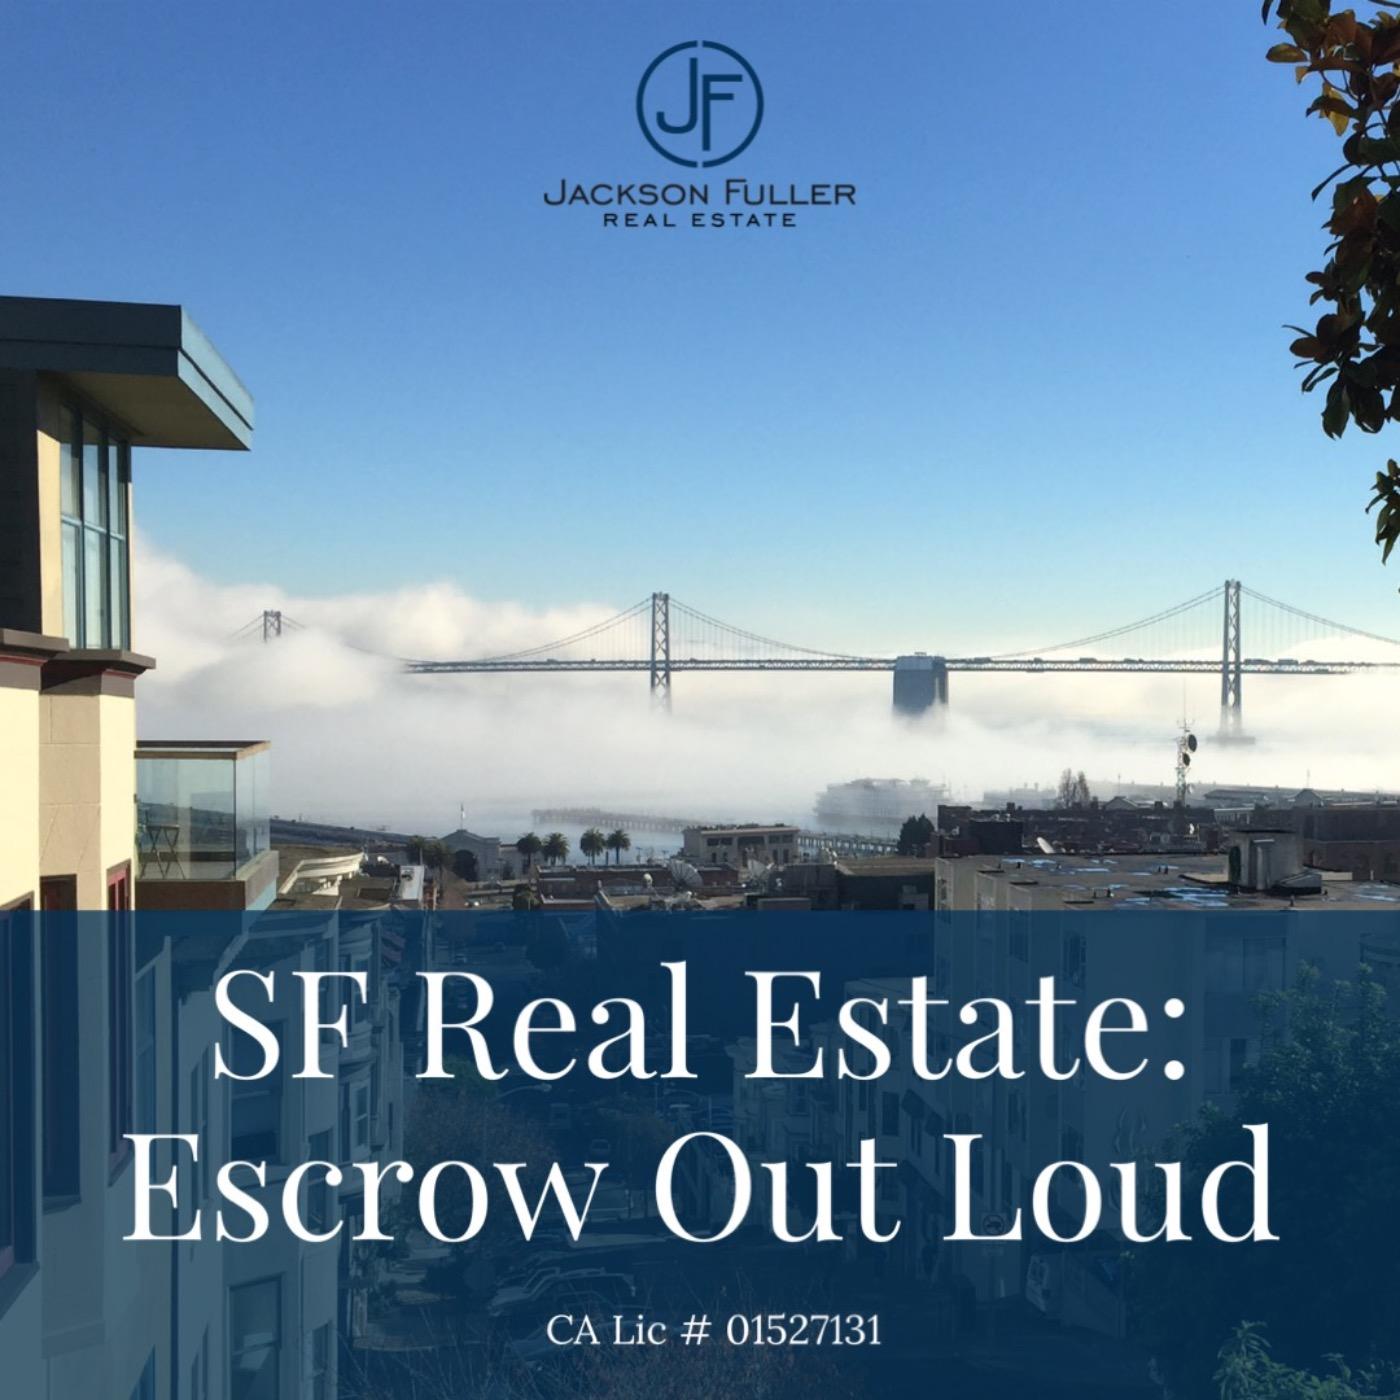 San Francisco Real Estate: Escrow Out Loud